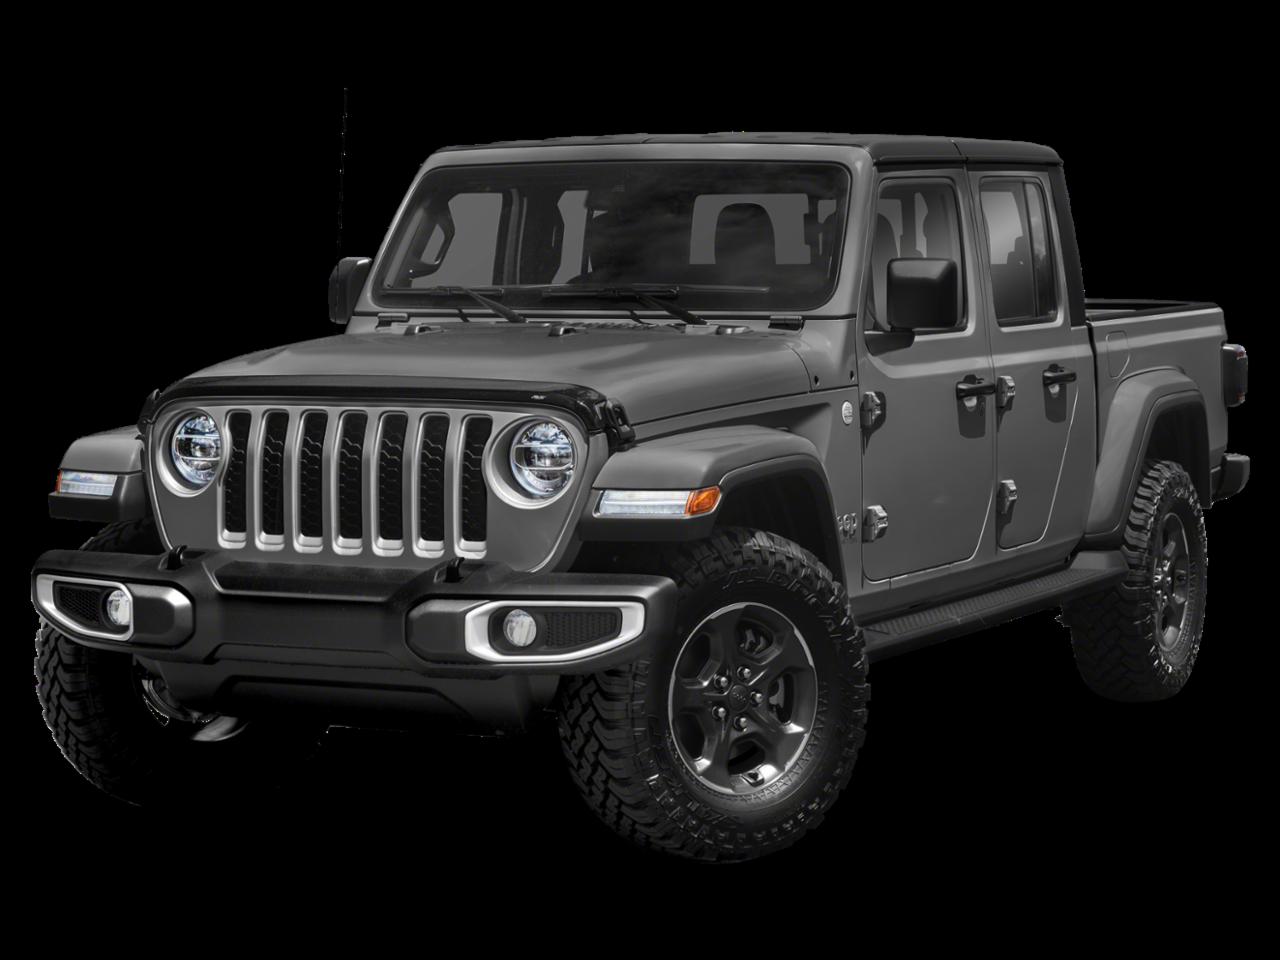 "2020 Jeep<br/><span class=""vdp-trim"">Gladiator Overland 4WD Crew Cab Pickup</span>"